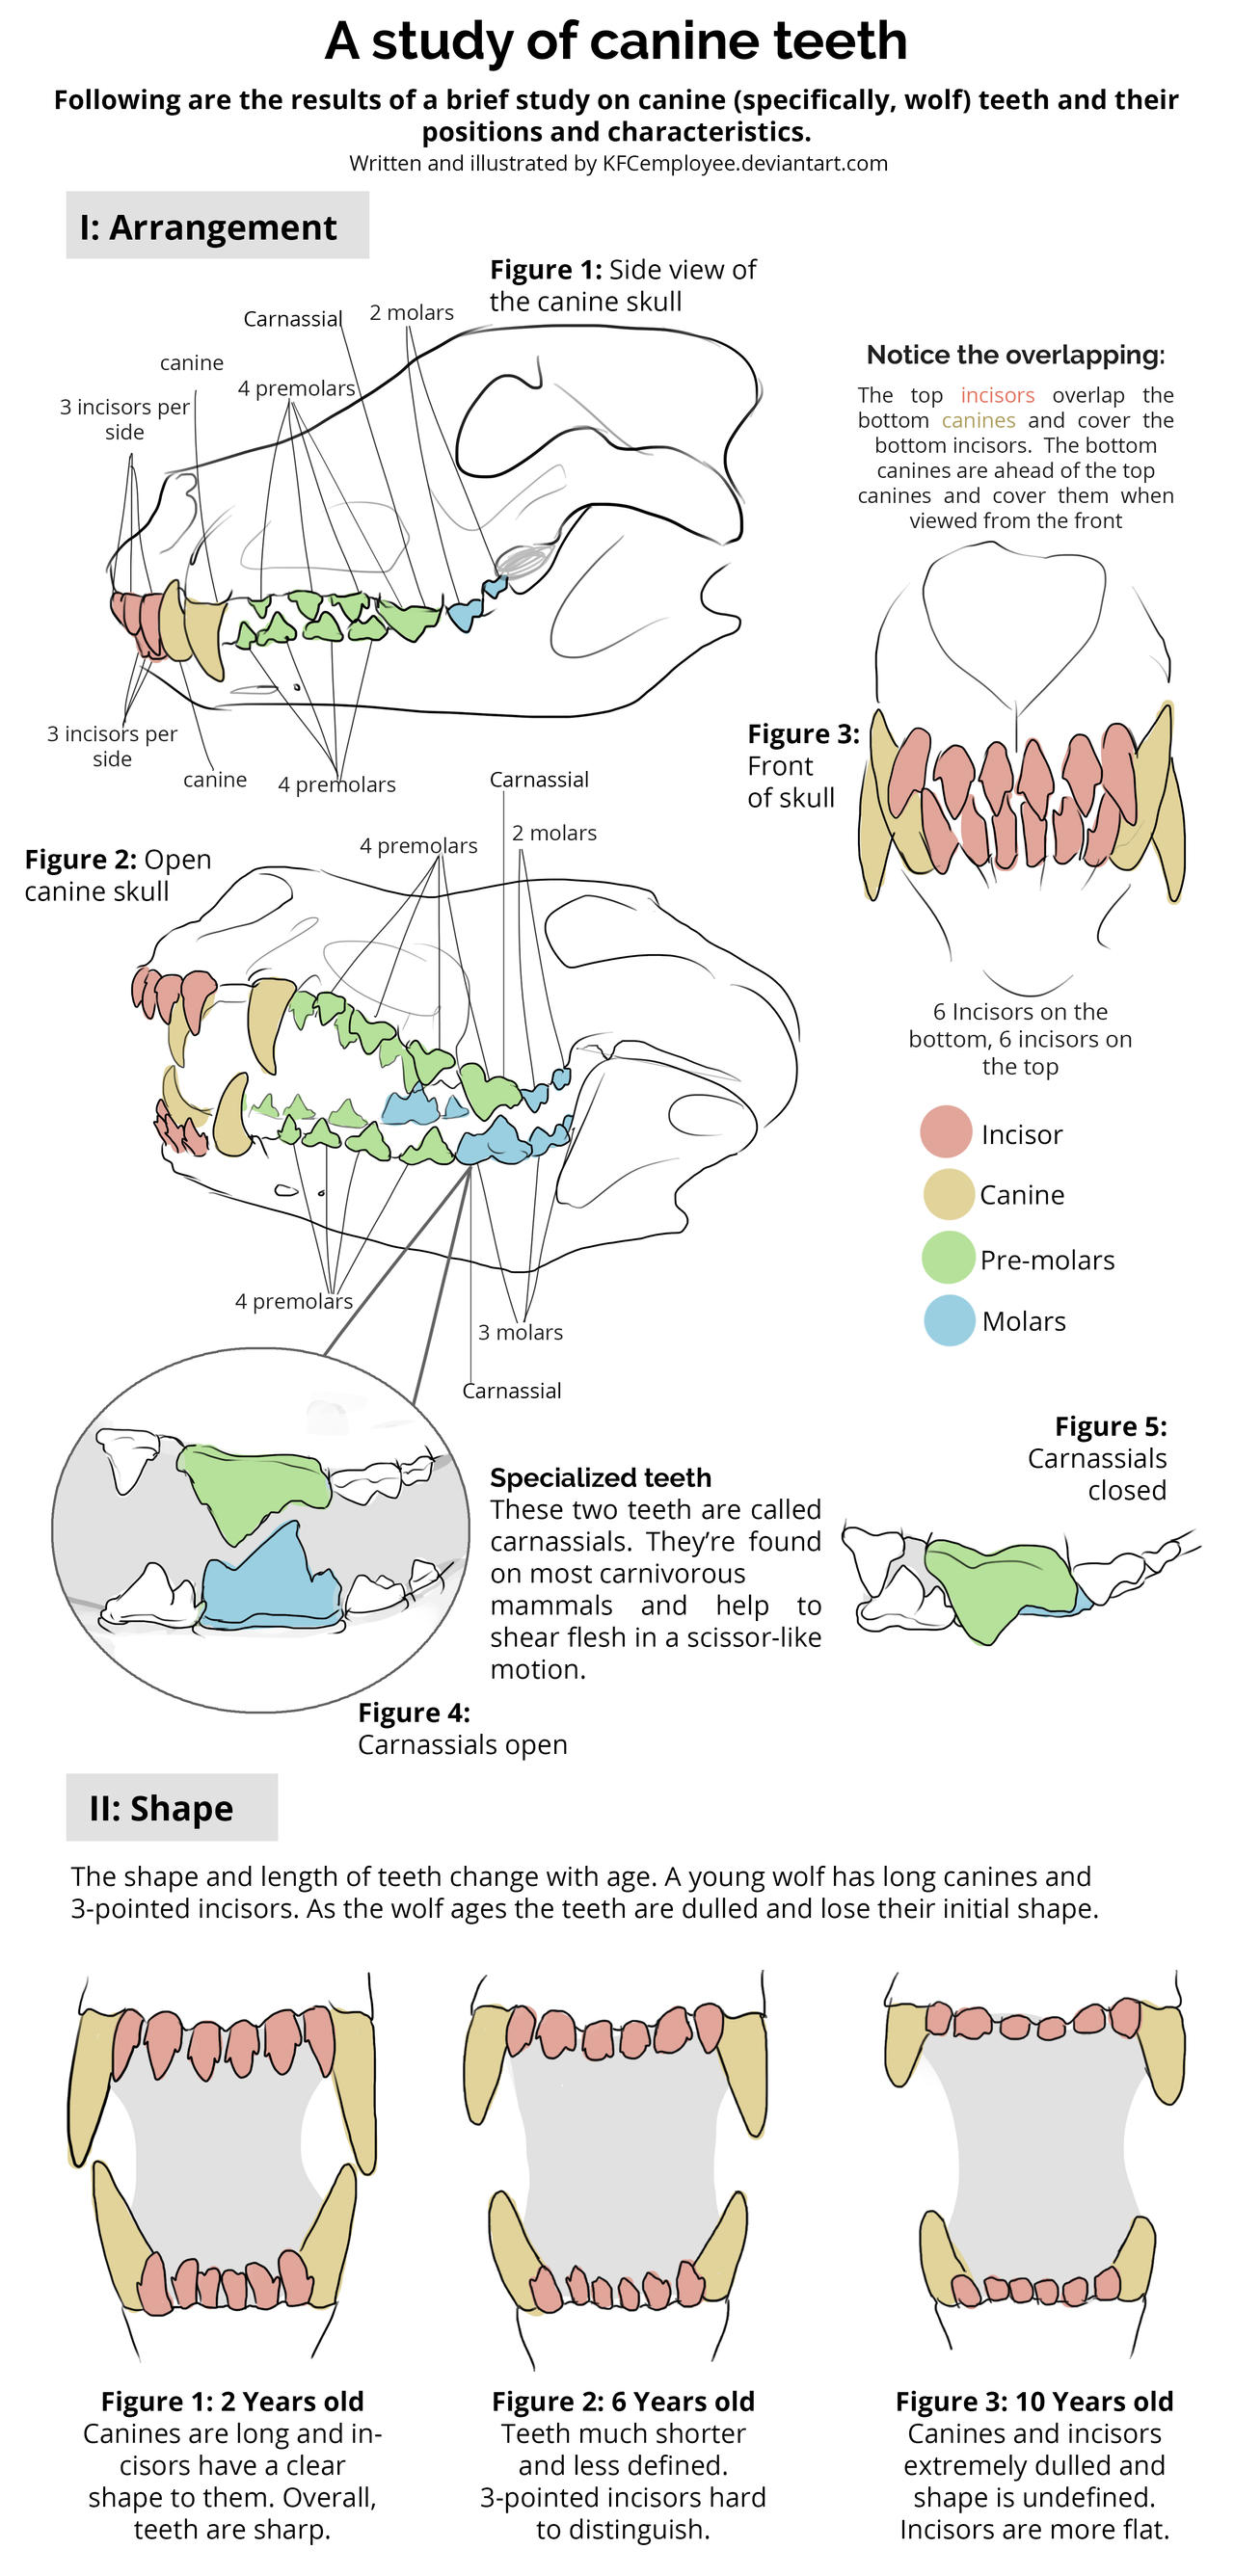 Canine teeth study by KFCemployee on DeviantArt